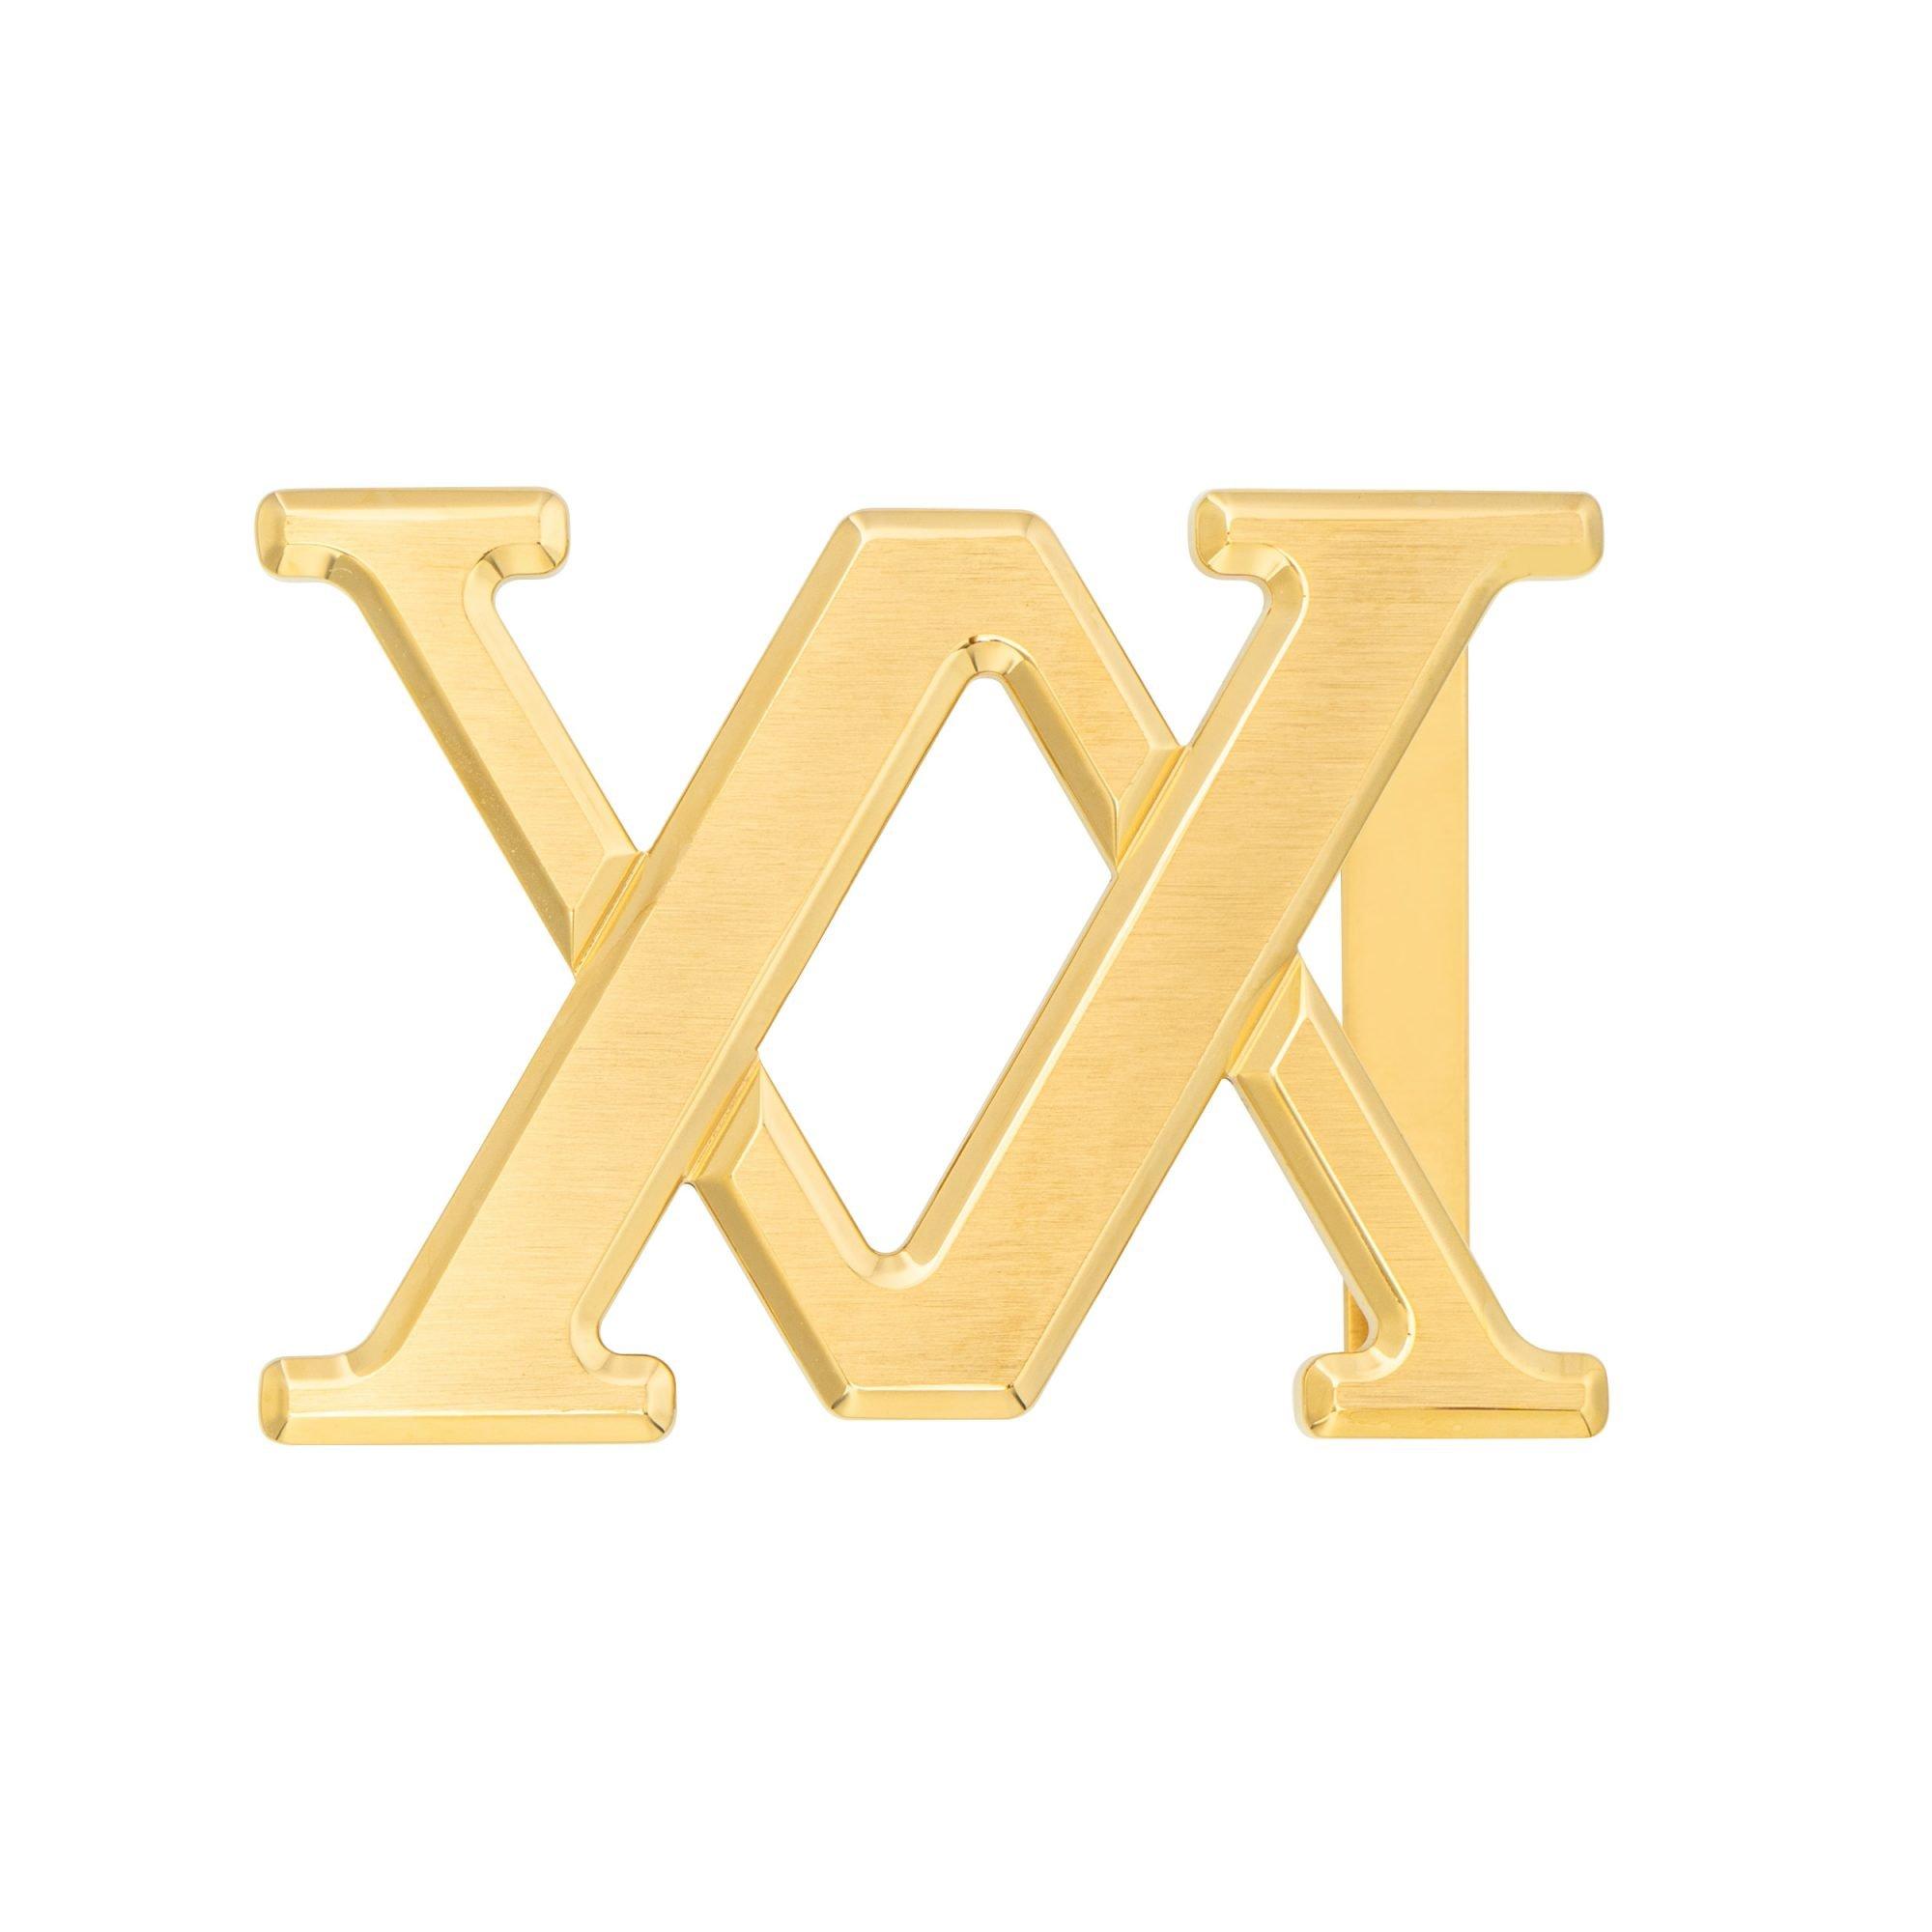 VIKTOR ALEXANDER 38MM STAINLESS STEEL BELT BUCKLE VA LOGO YELLOW GOLD FRONT PROFILE